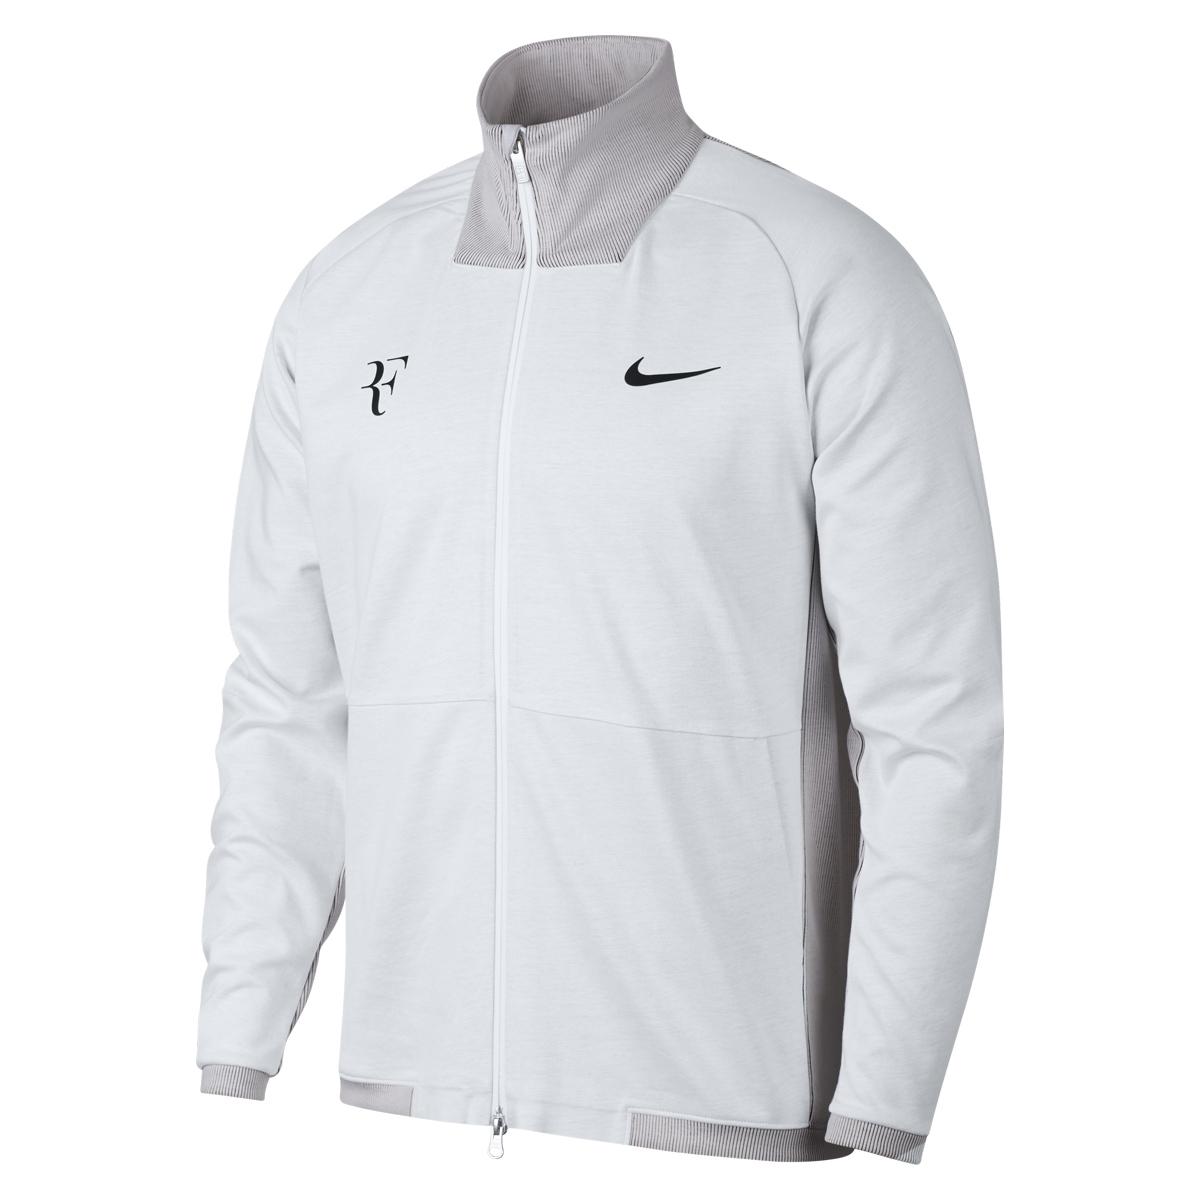 Roger Federer 2018 BNP Paribas Open Indian Wells Jacket - Roger Federer 2018 Indian Wells Nike Outfit